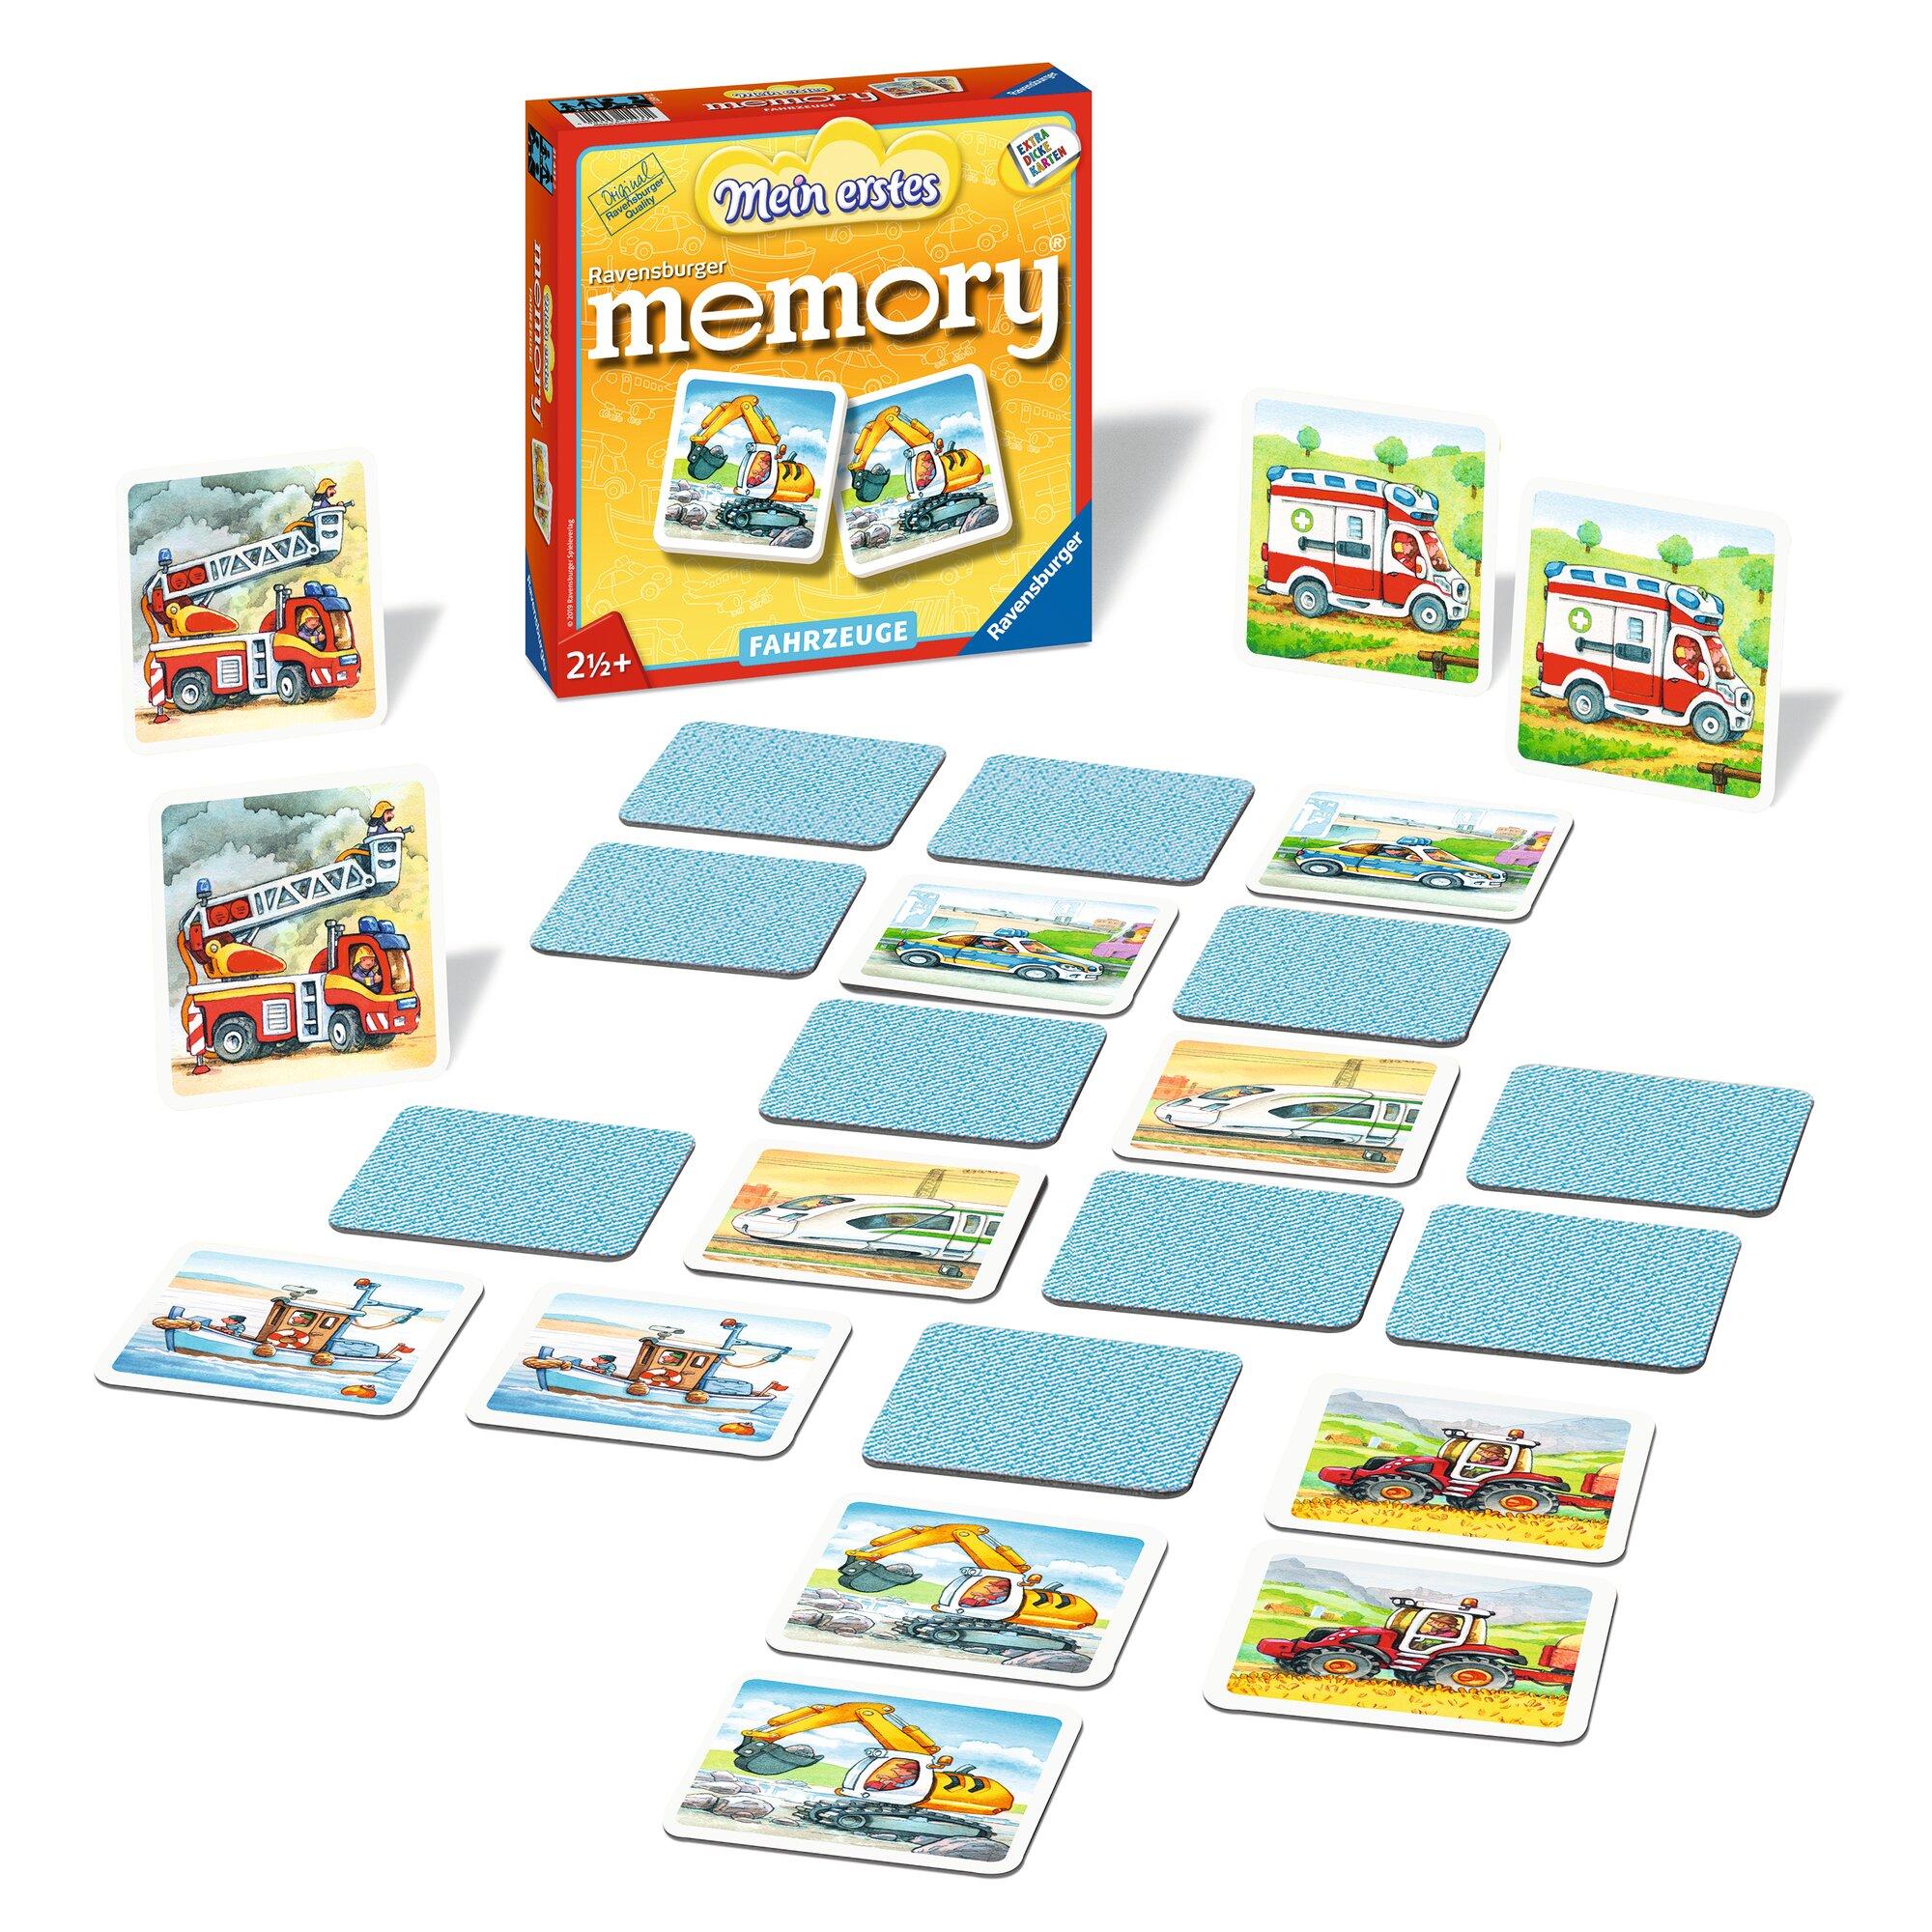 ravensburger-mein-erstes-memory-fahrzeuge-legekartenspiel